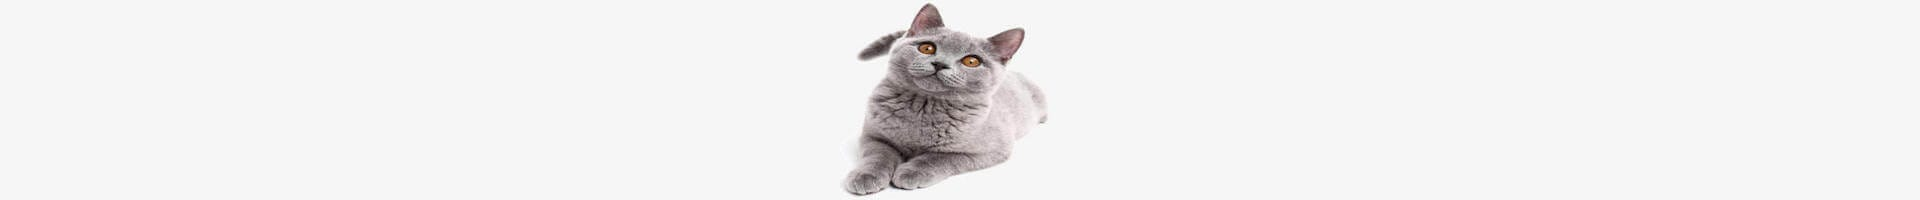 cats behaviour